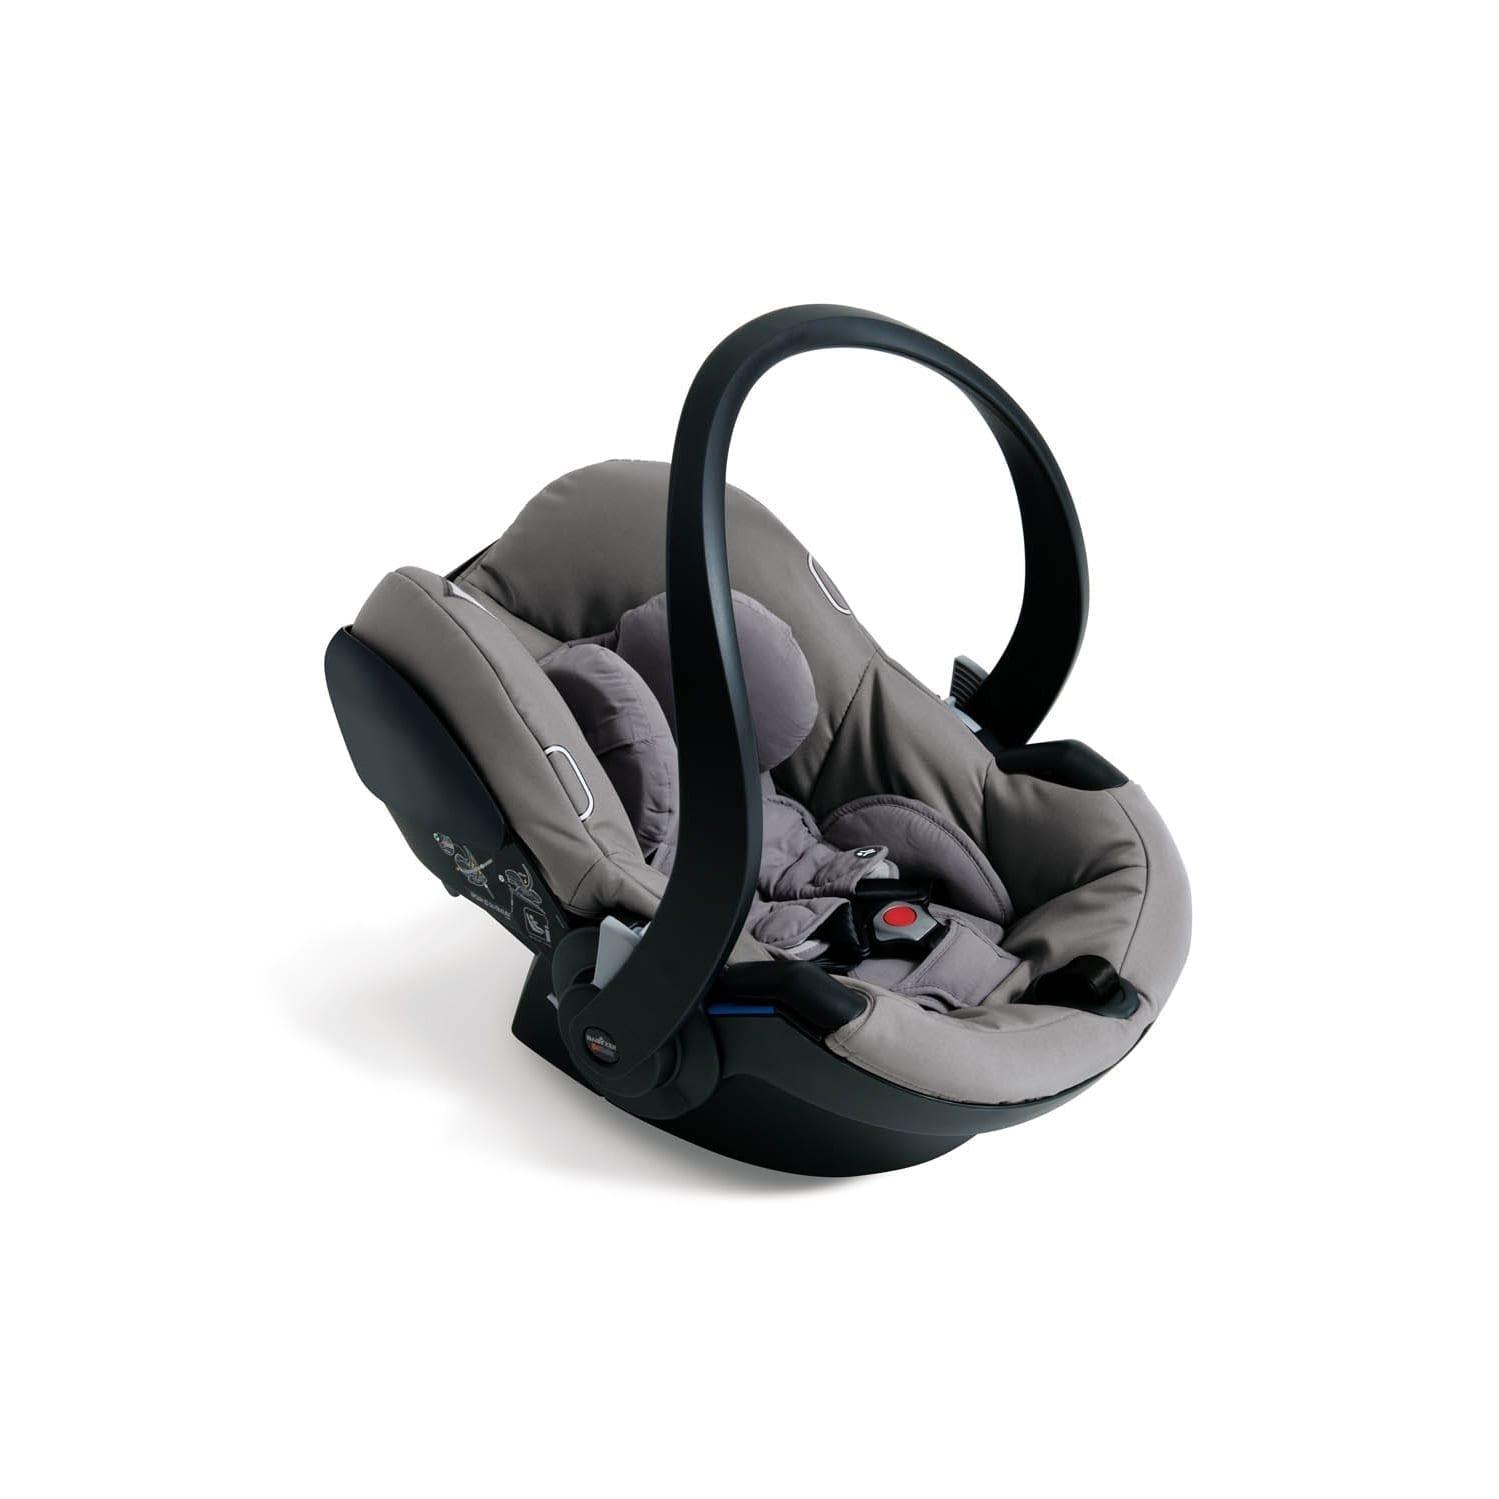 Babyzen BeSafe iZi Go Modular Car Seat including Adapters Grey